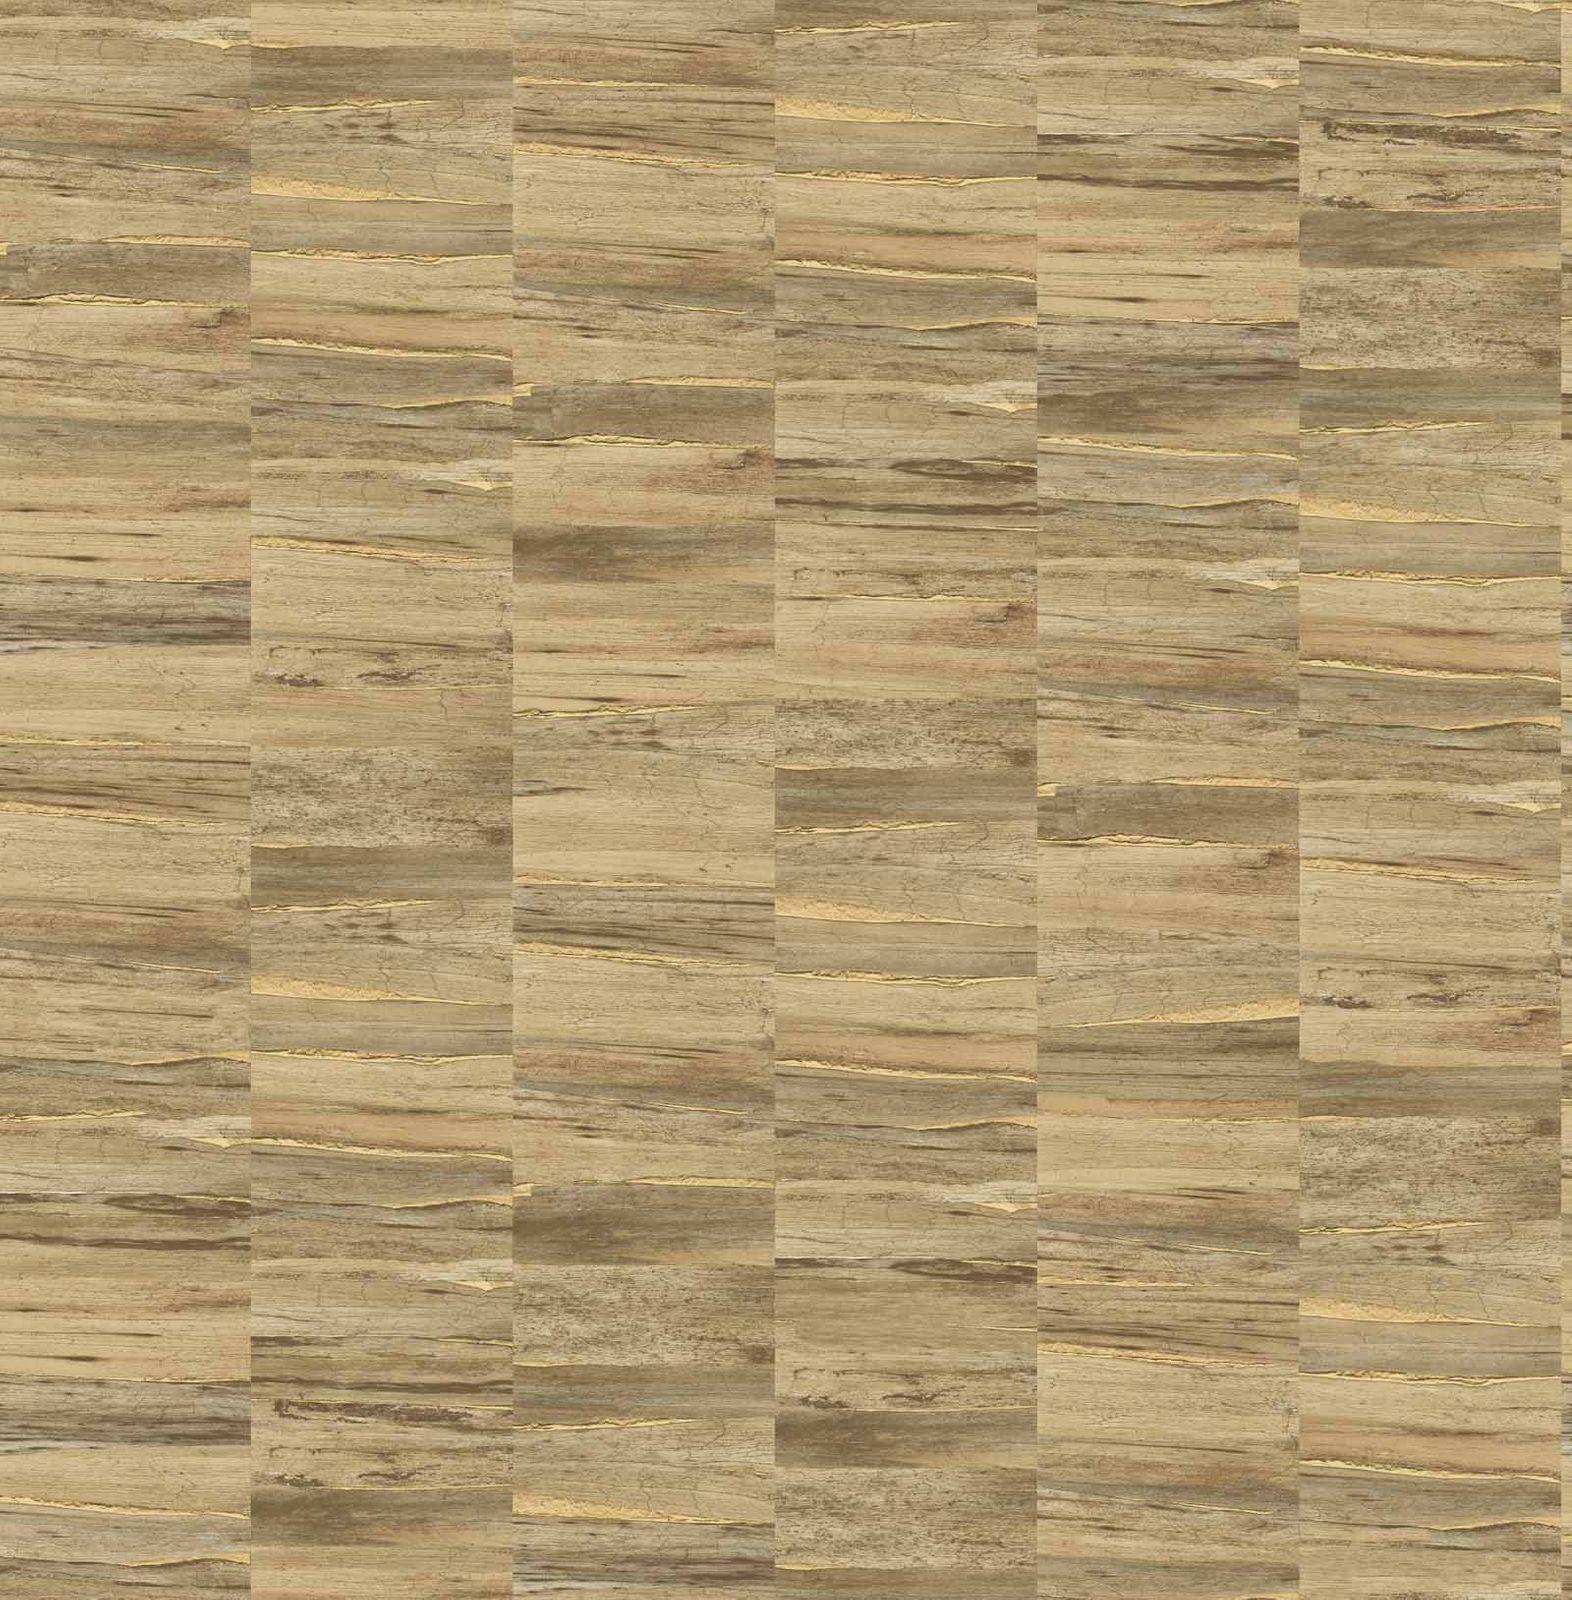 Tapete Vlies Holz Braun Gold Glanz Artisan 124906